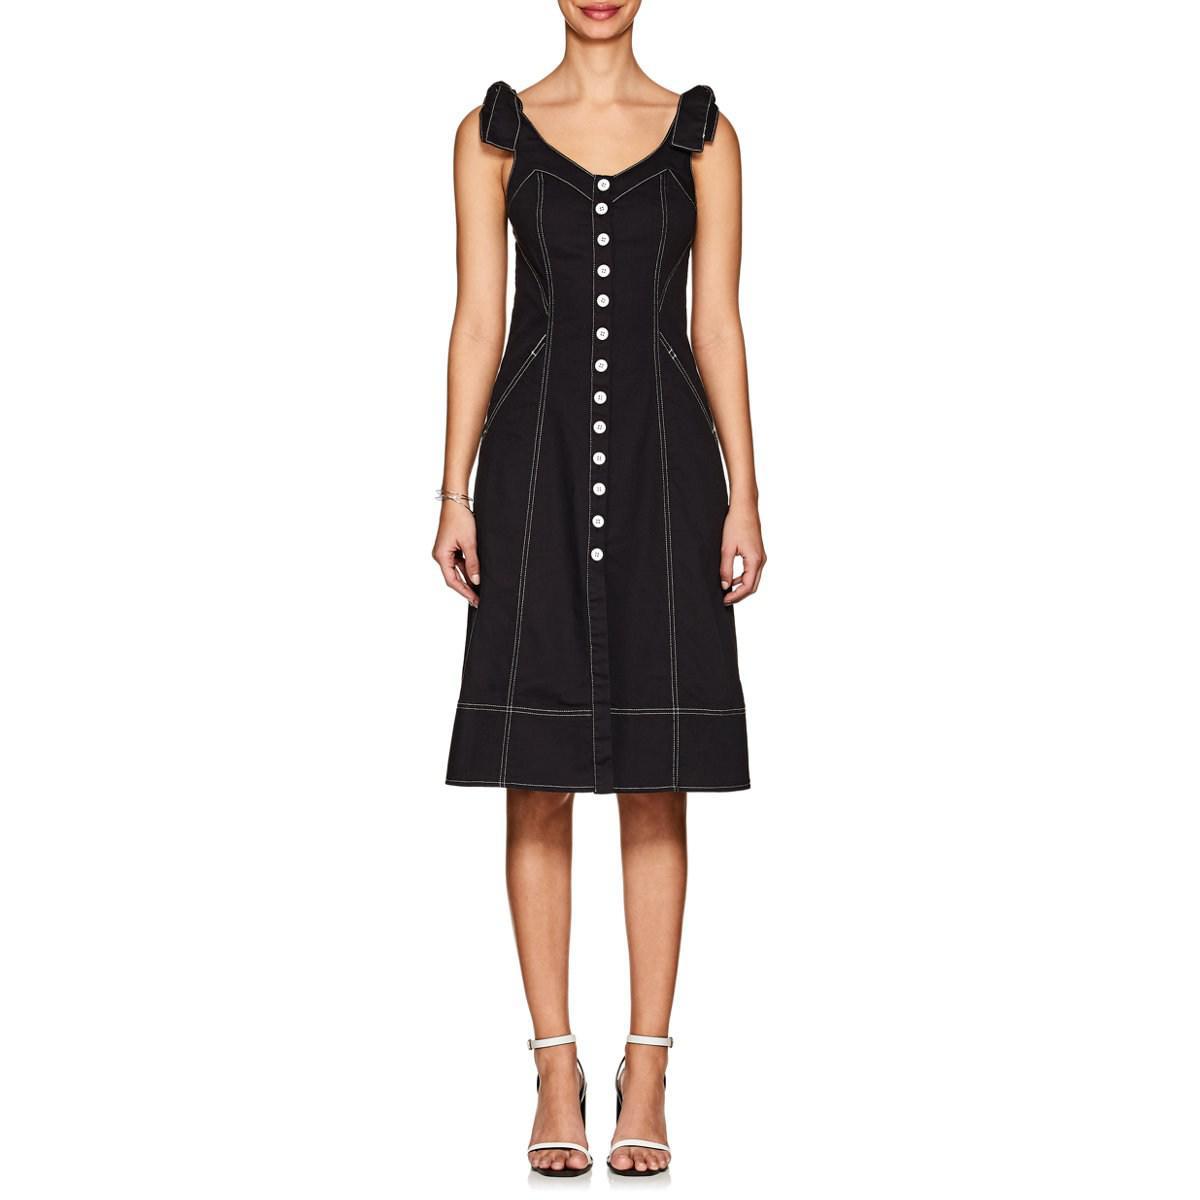 ca3d9015062 Lyst - Ulla Johnson Emory Topstitched Denim Button-down Dress in Black